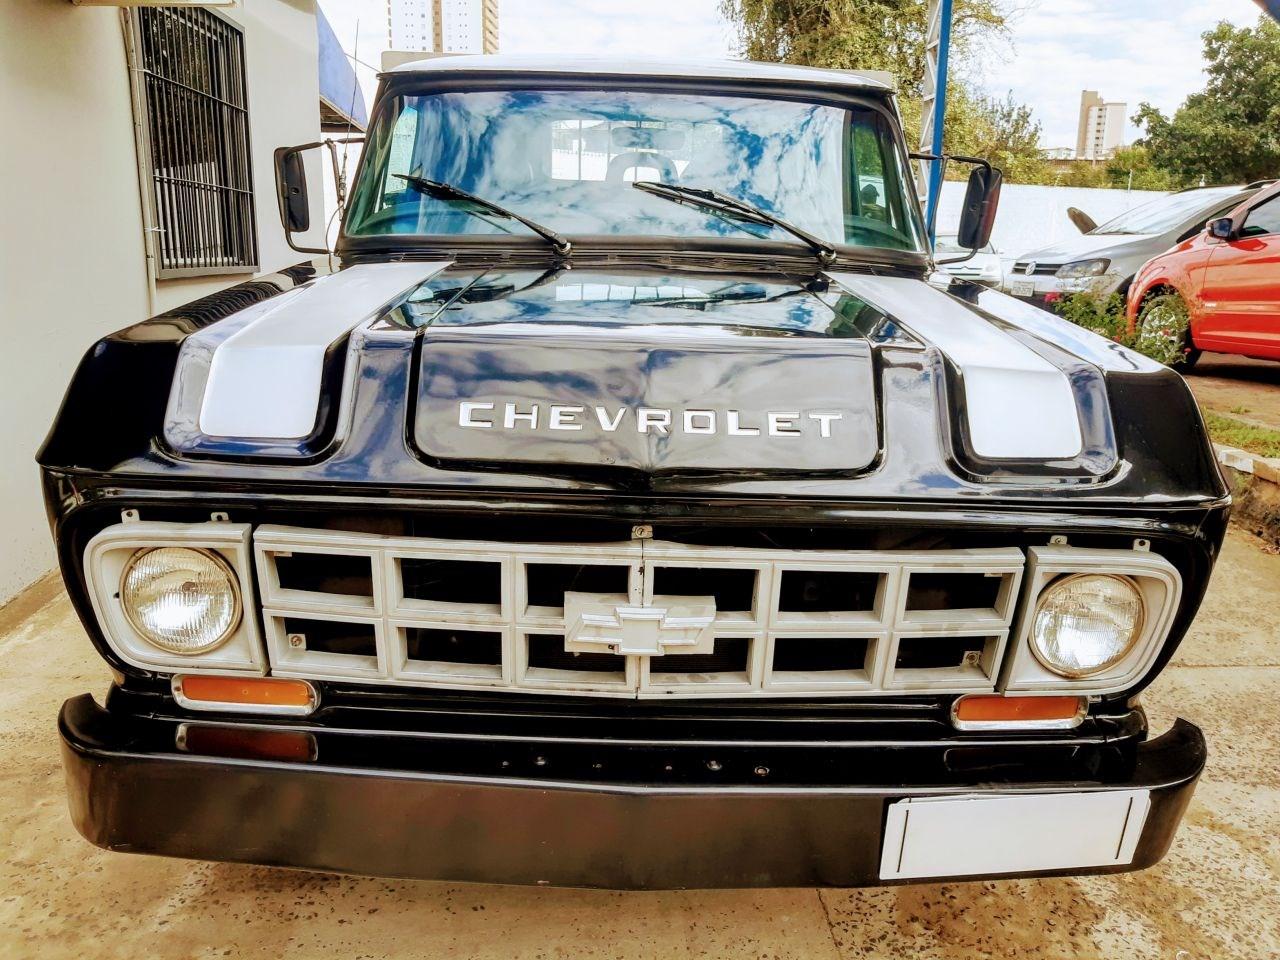 //www.autoline.com.br/carro/chevrolet/d-10-pick-up-40-custom-de-luxe-cabsimp-90cv-2p-diesel-manu/1980/piracicaba-sp/15246320